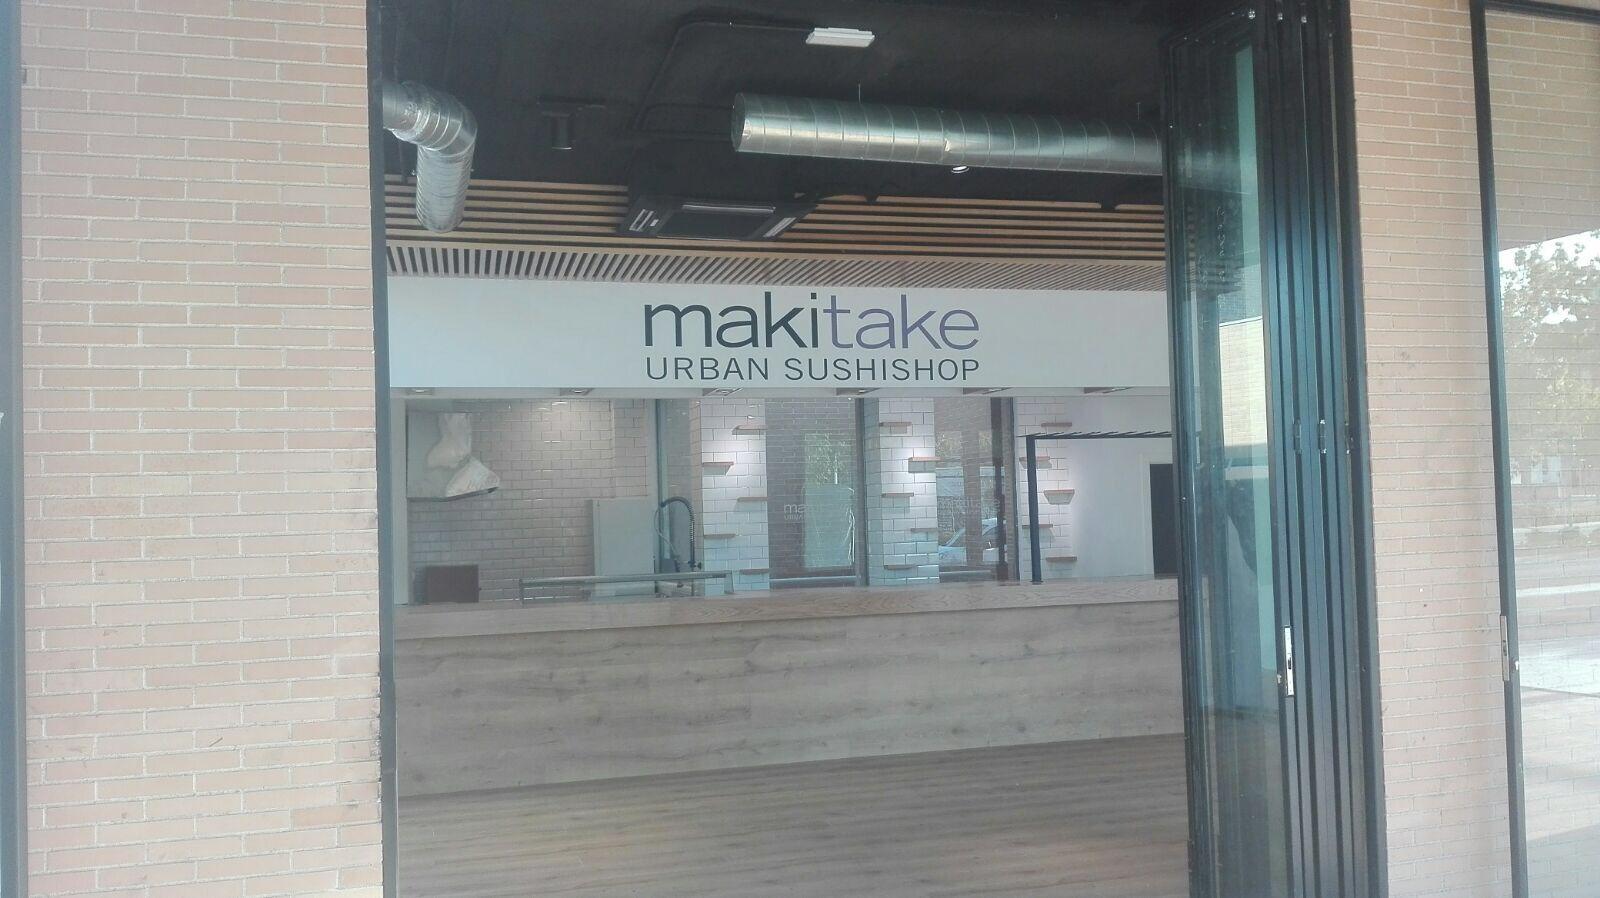 BNos hemos encargados de proyectos de obra para la franquicia Maquitake